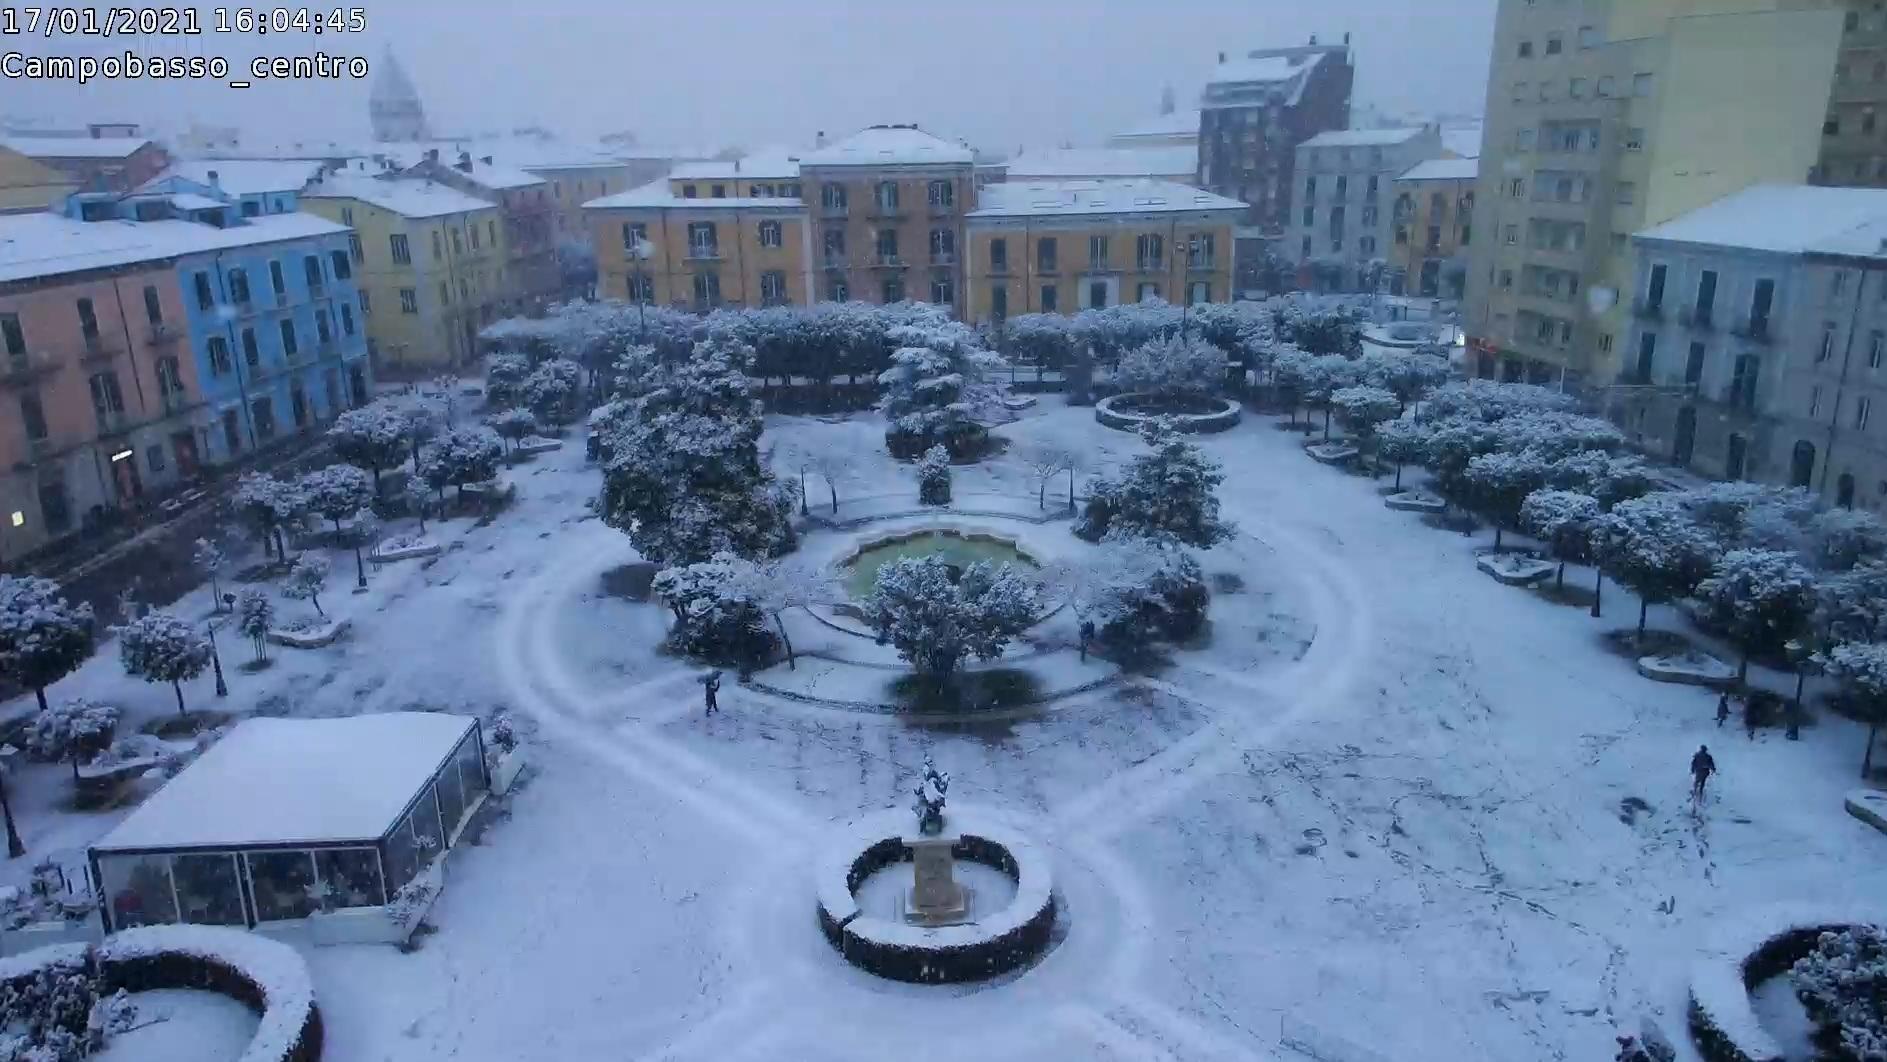 Neve a Campobasso, imbiancato il capoluogo molisano